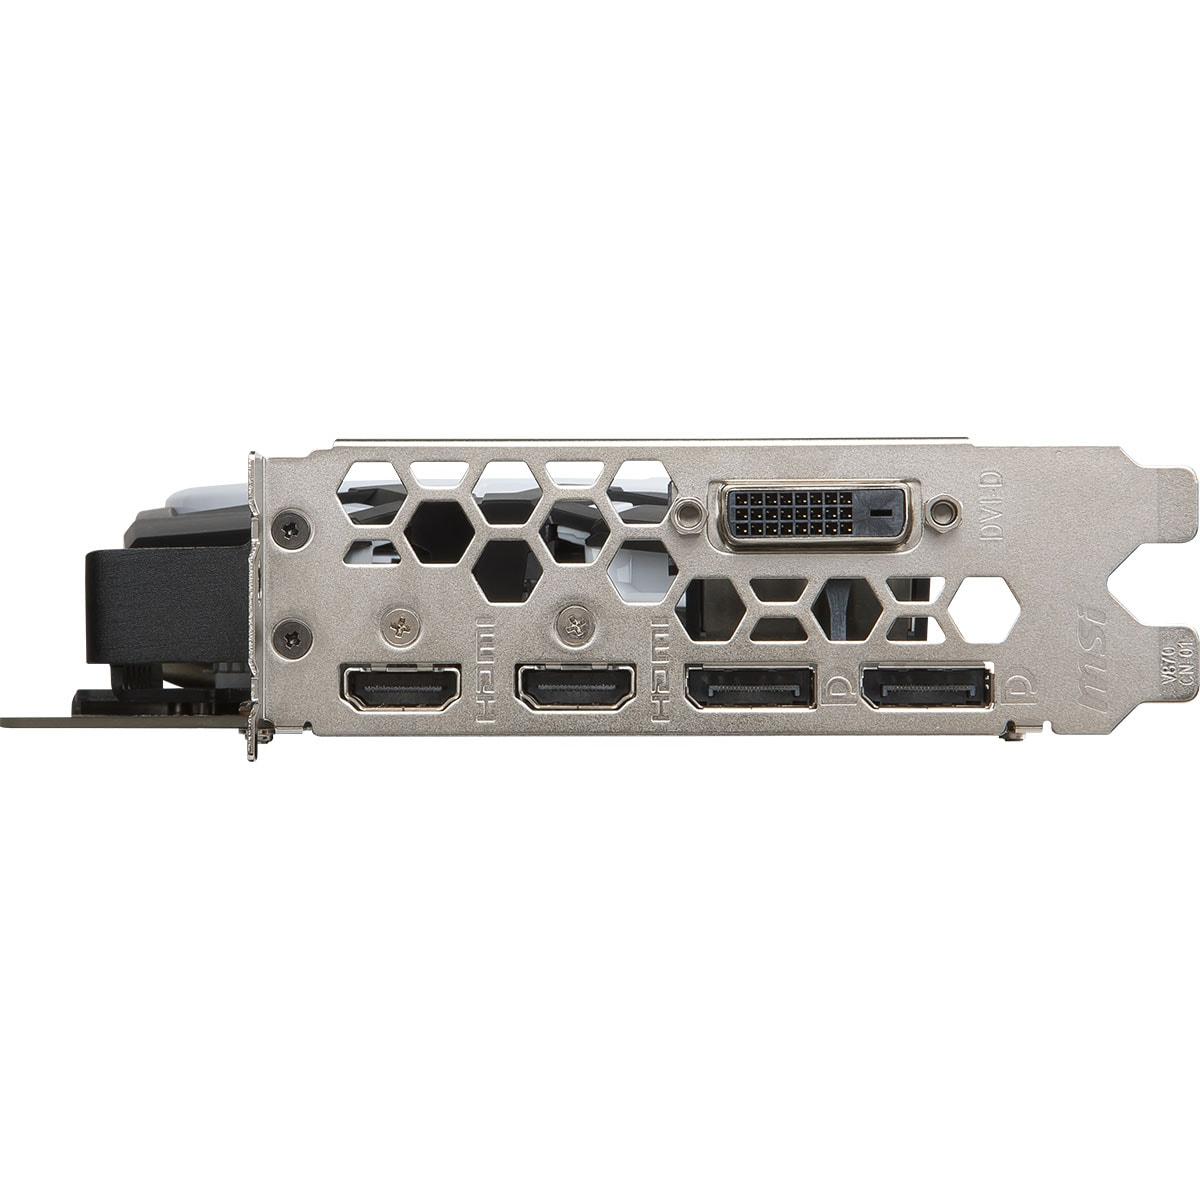 MSI GTX 1080 Ti ARMOR 11G OC 11Go - Carte graphique MSI - 1